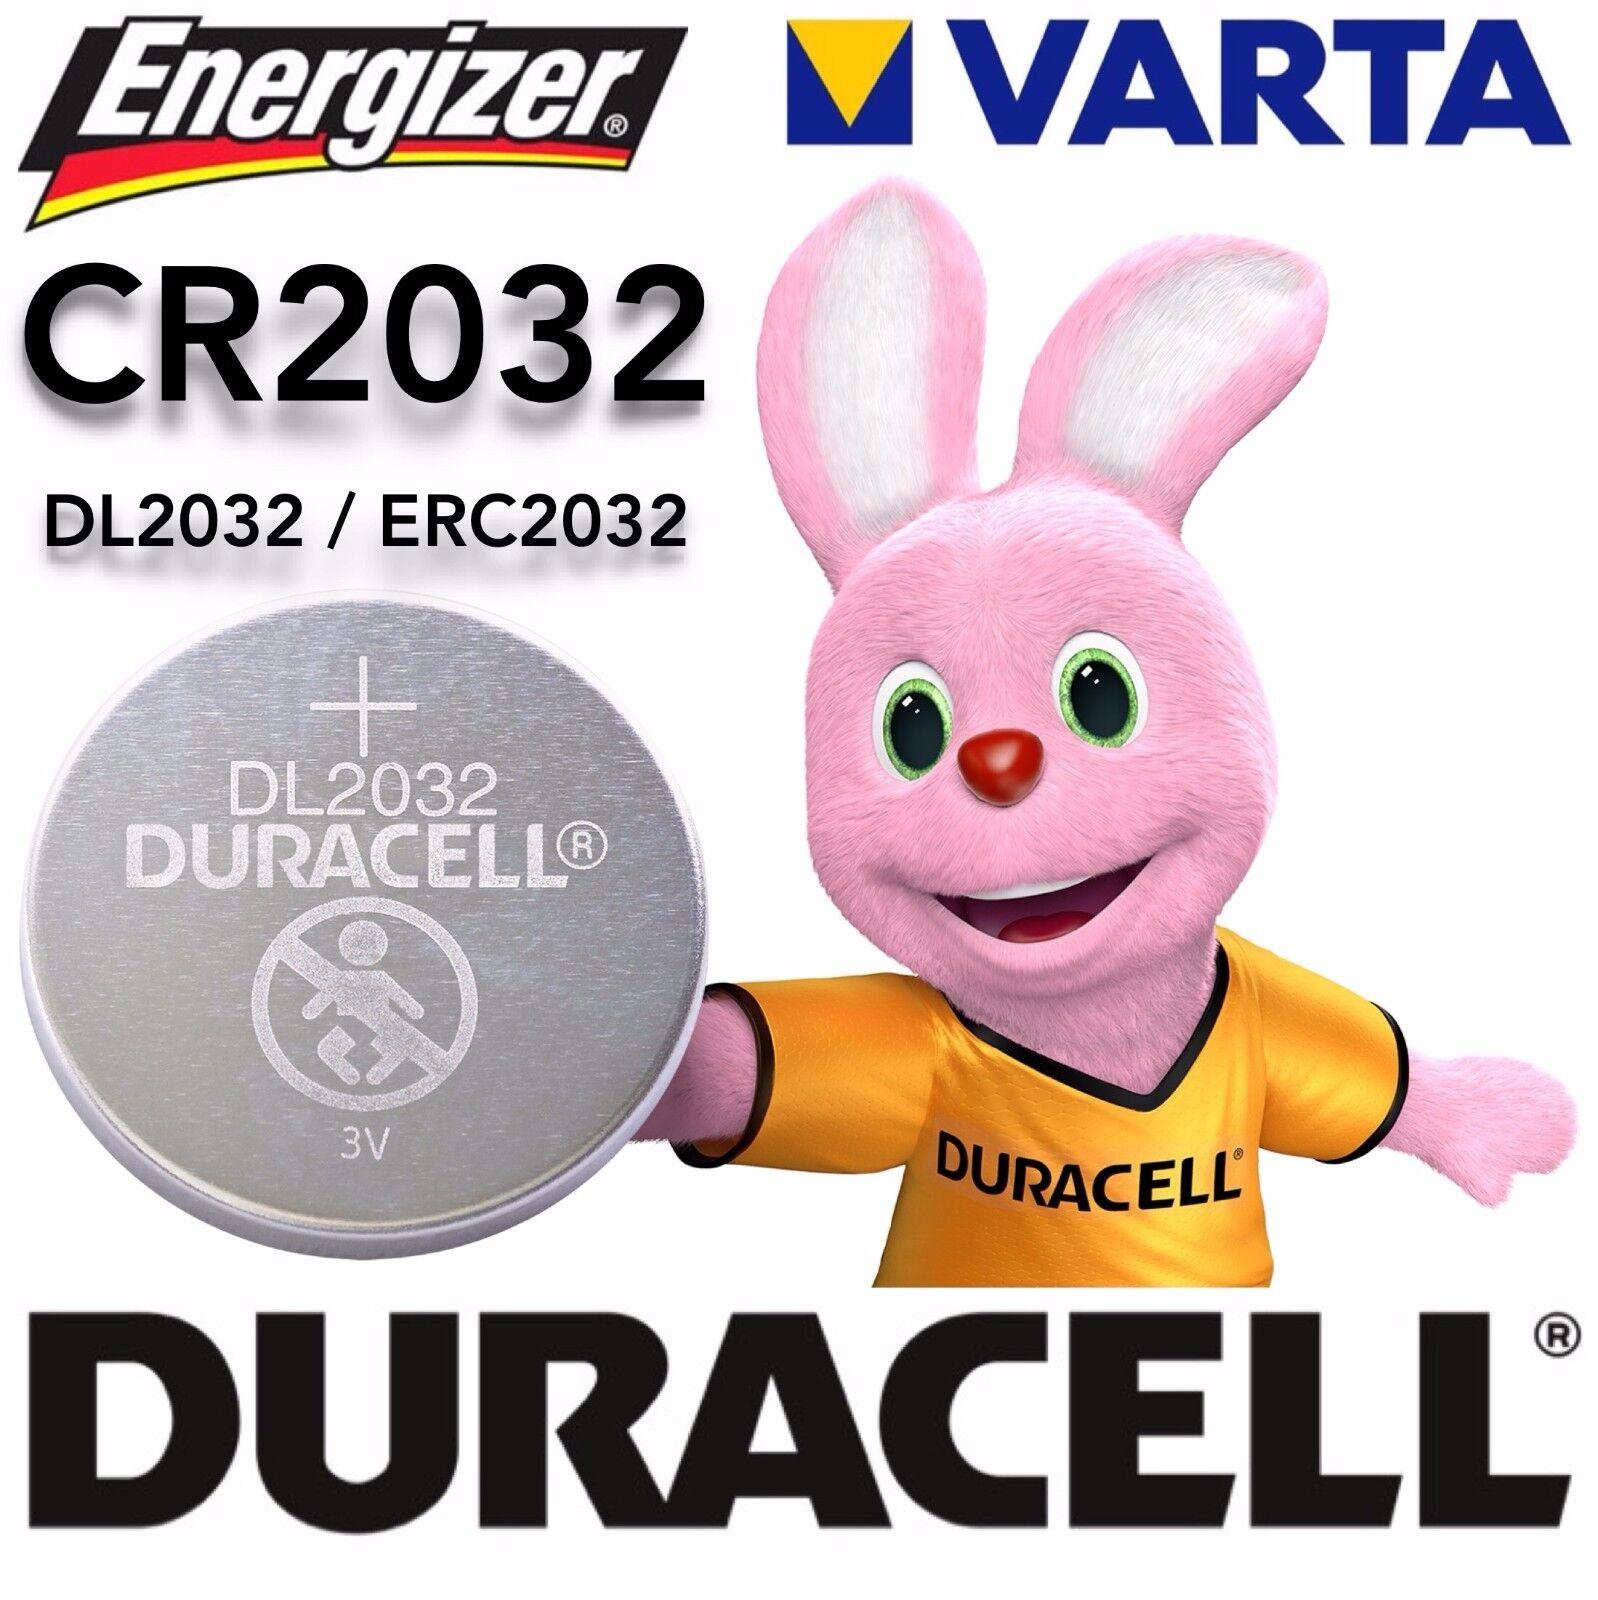 Varta Duracell Energizer CR2032 DL2032 ERC2032 3V Volt  | Angenehmes Aussehen